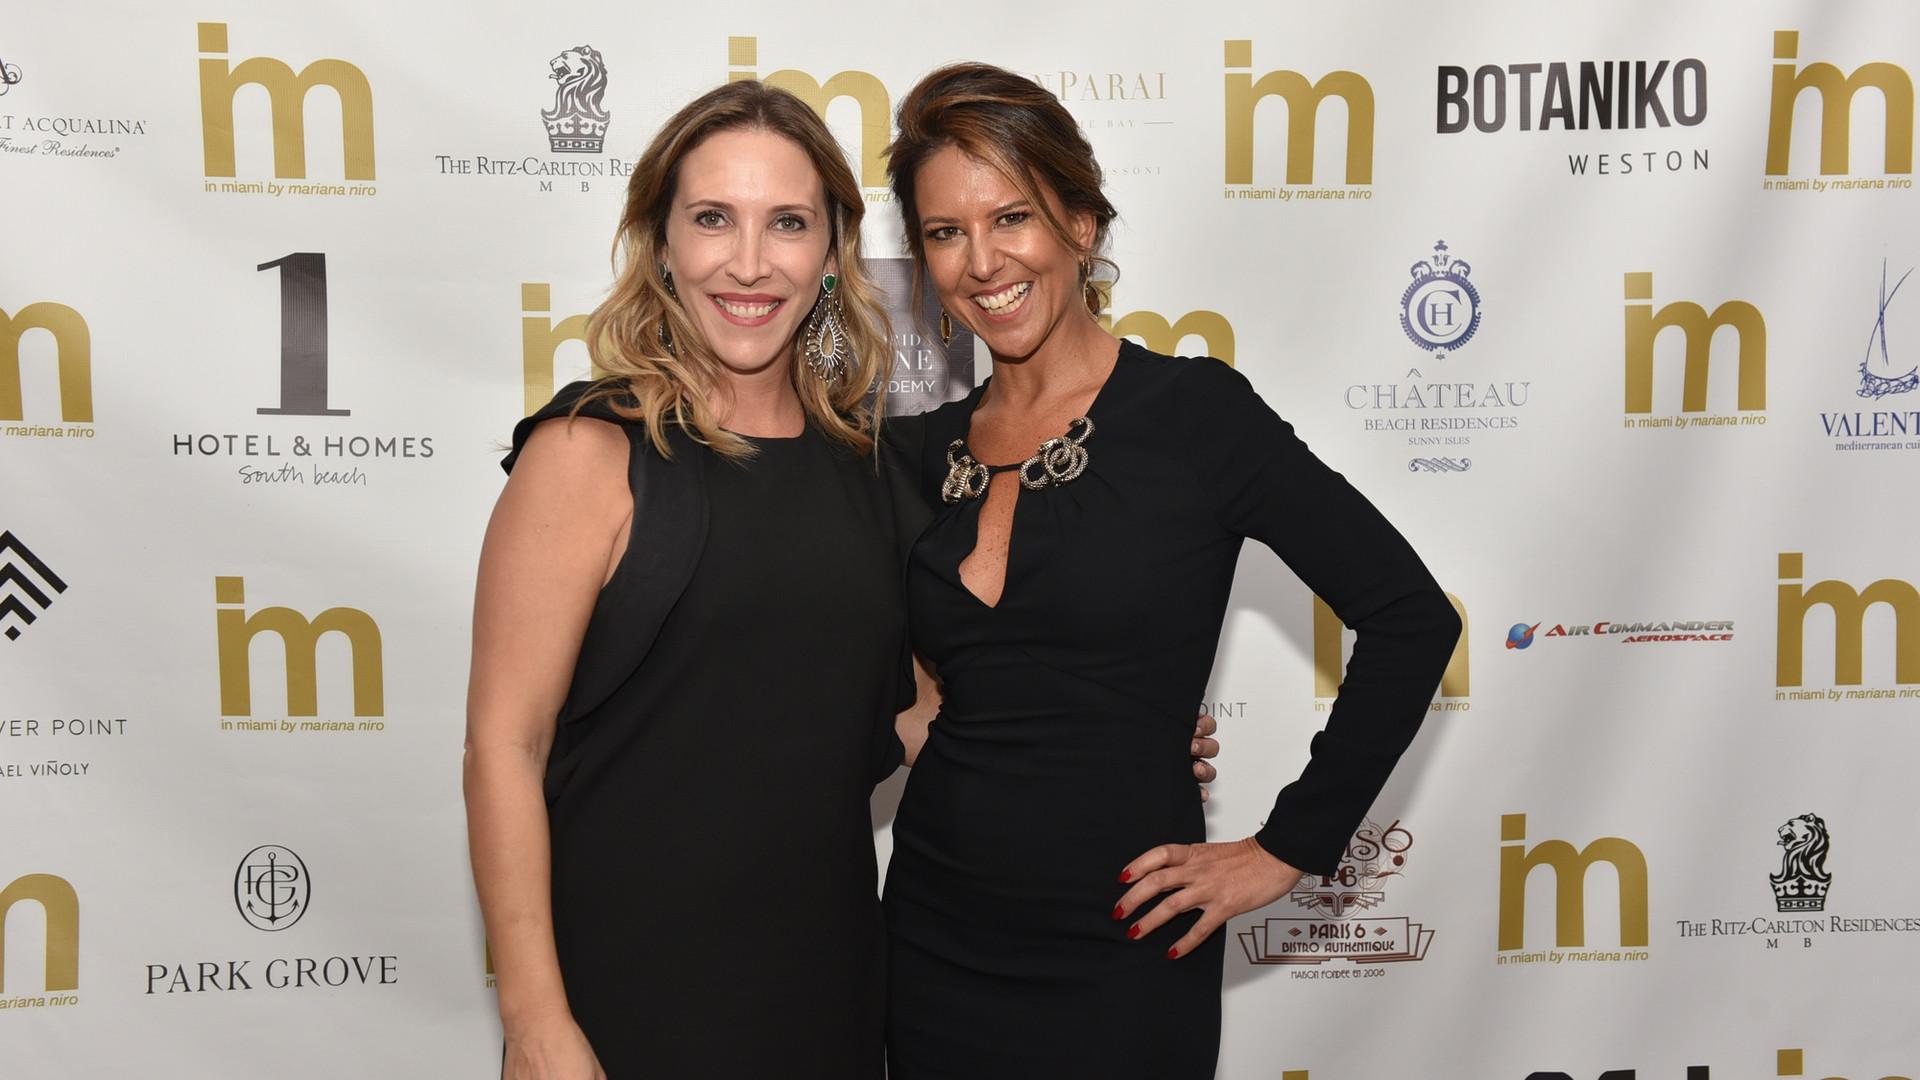 Renata K and Mariana